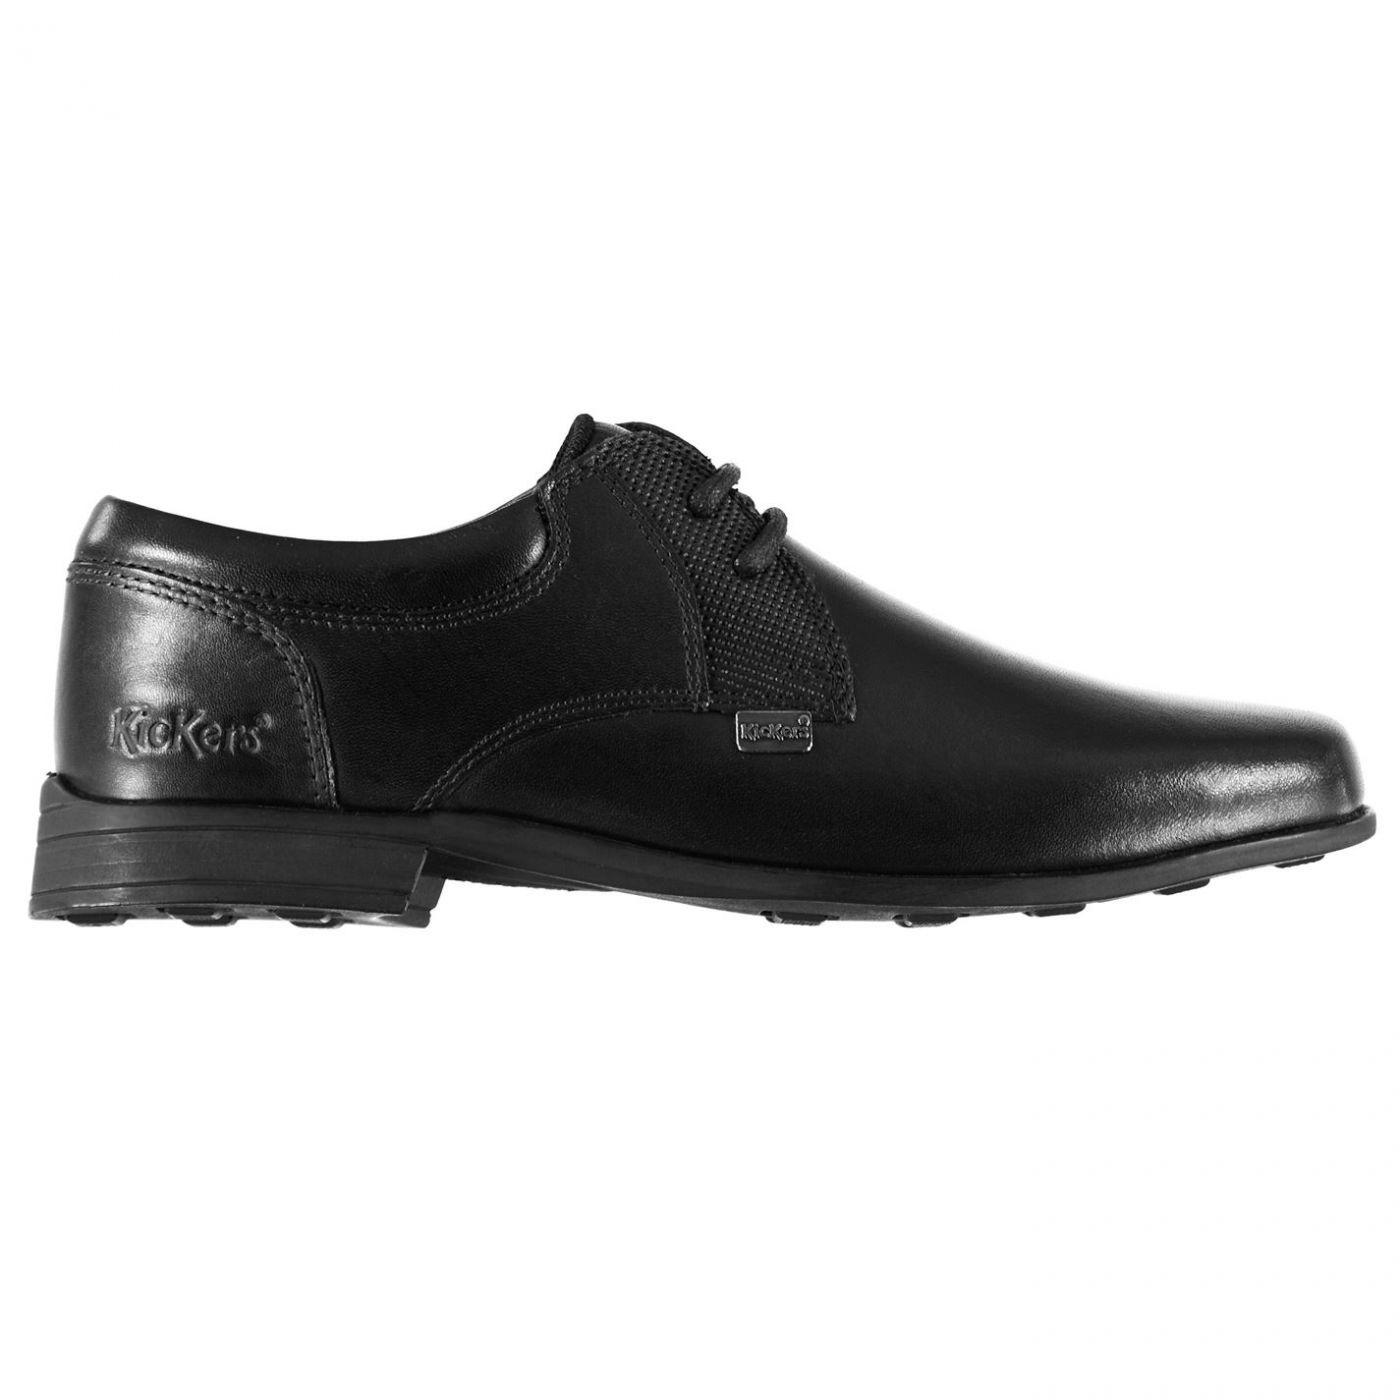 Kickers Ferock Junior Boys Shoes